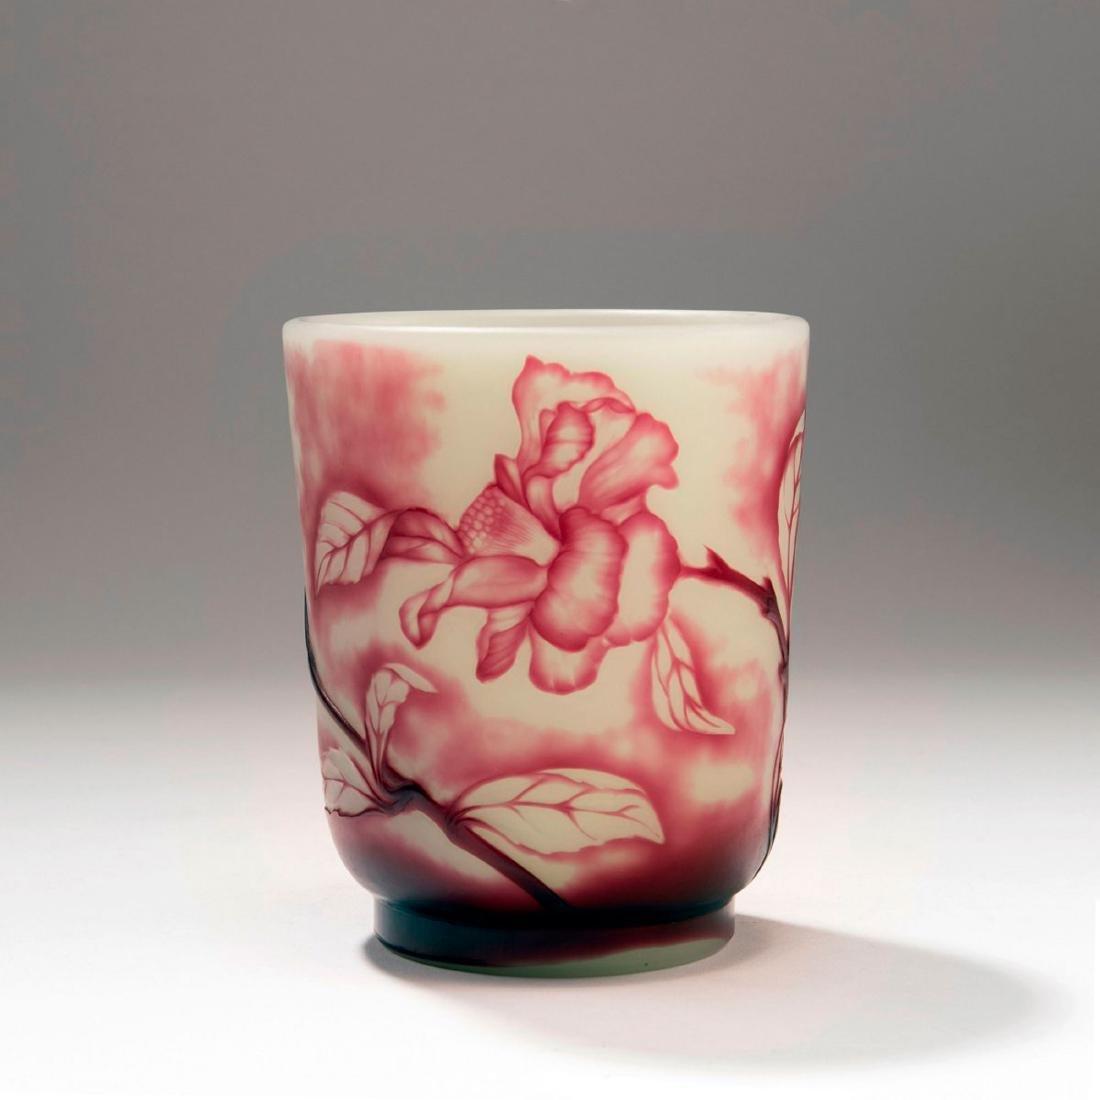 'Roses' vase, 1900-10